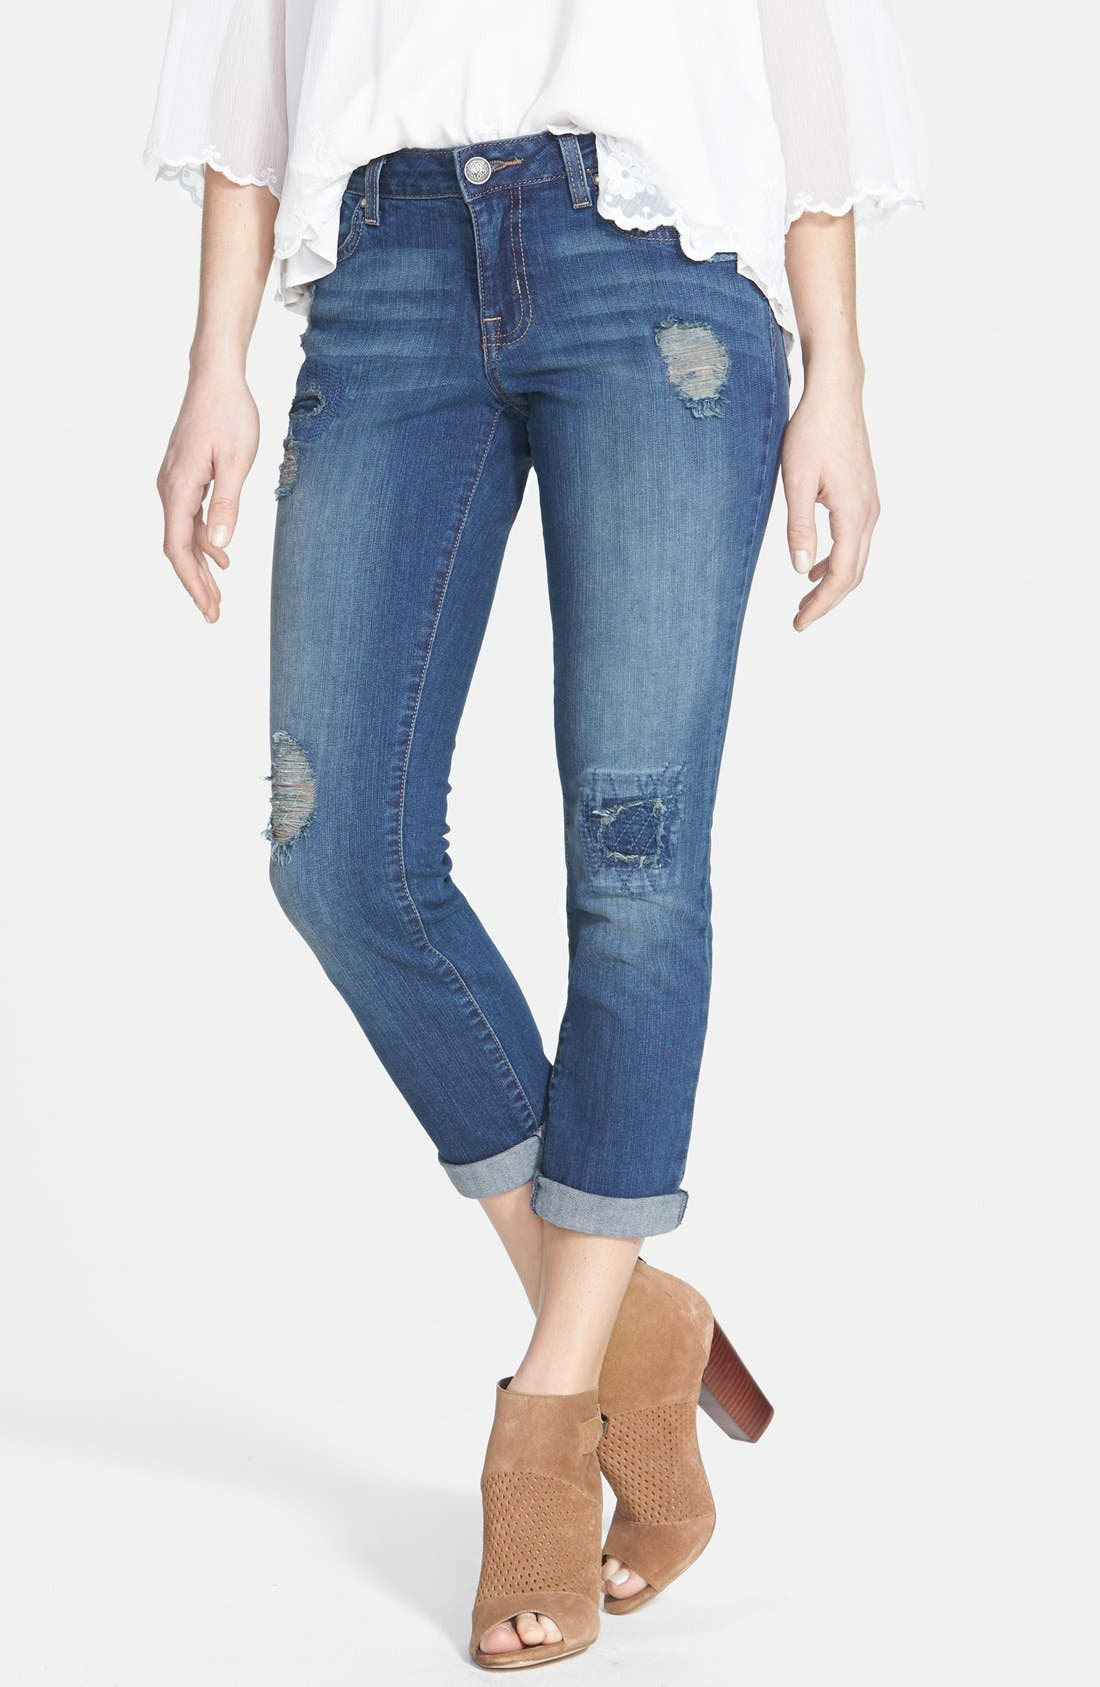 Alternate Image 1 Selected - Jessica Simpson 'Forever' Distressed Crop Skinny Jeans (Bluesine/Spain)